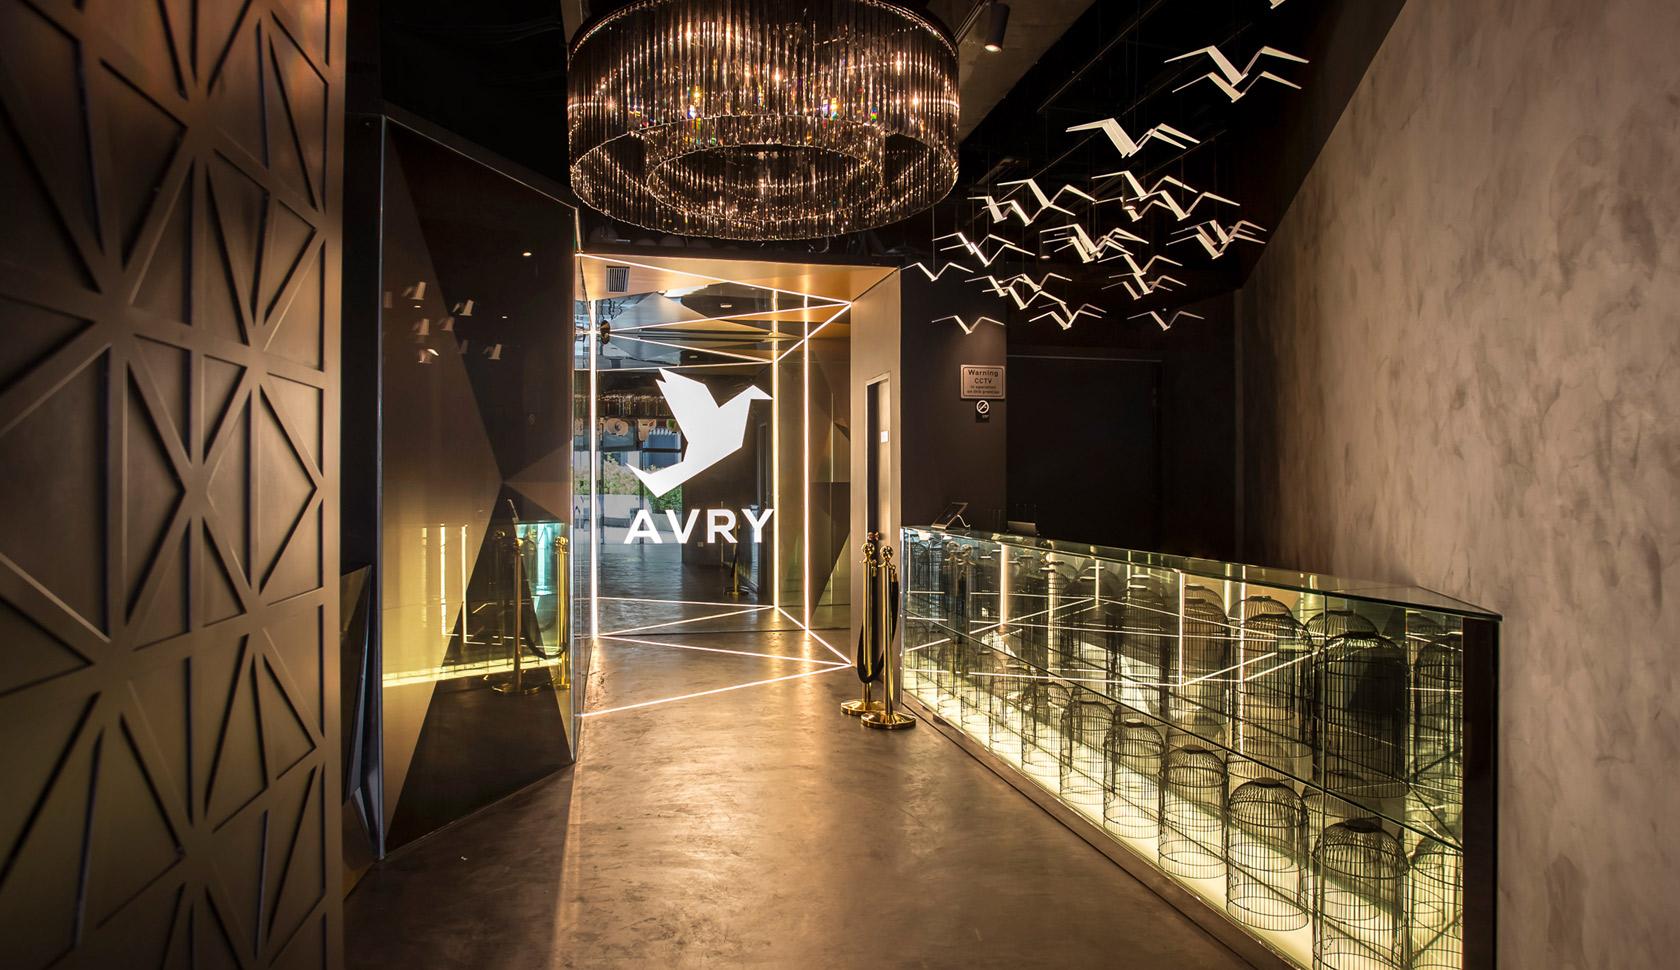 AVRY BAR & CLUB, SINGAPORE